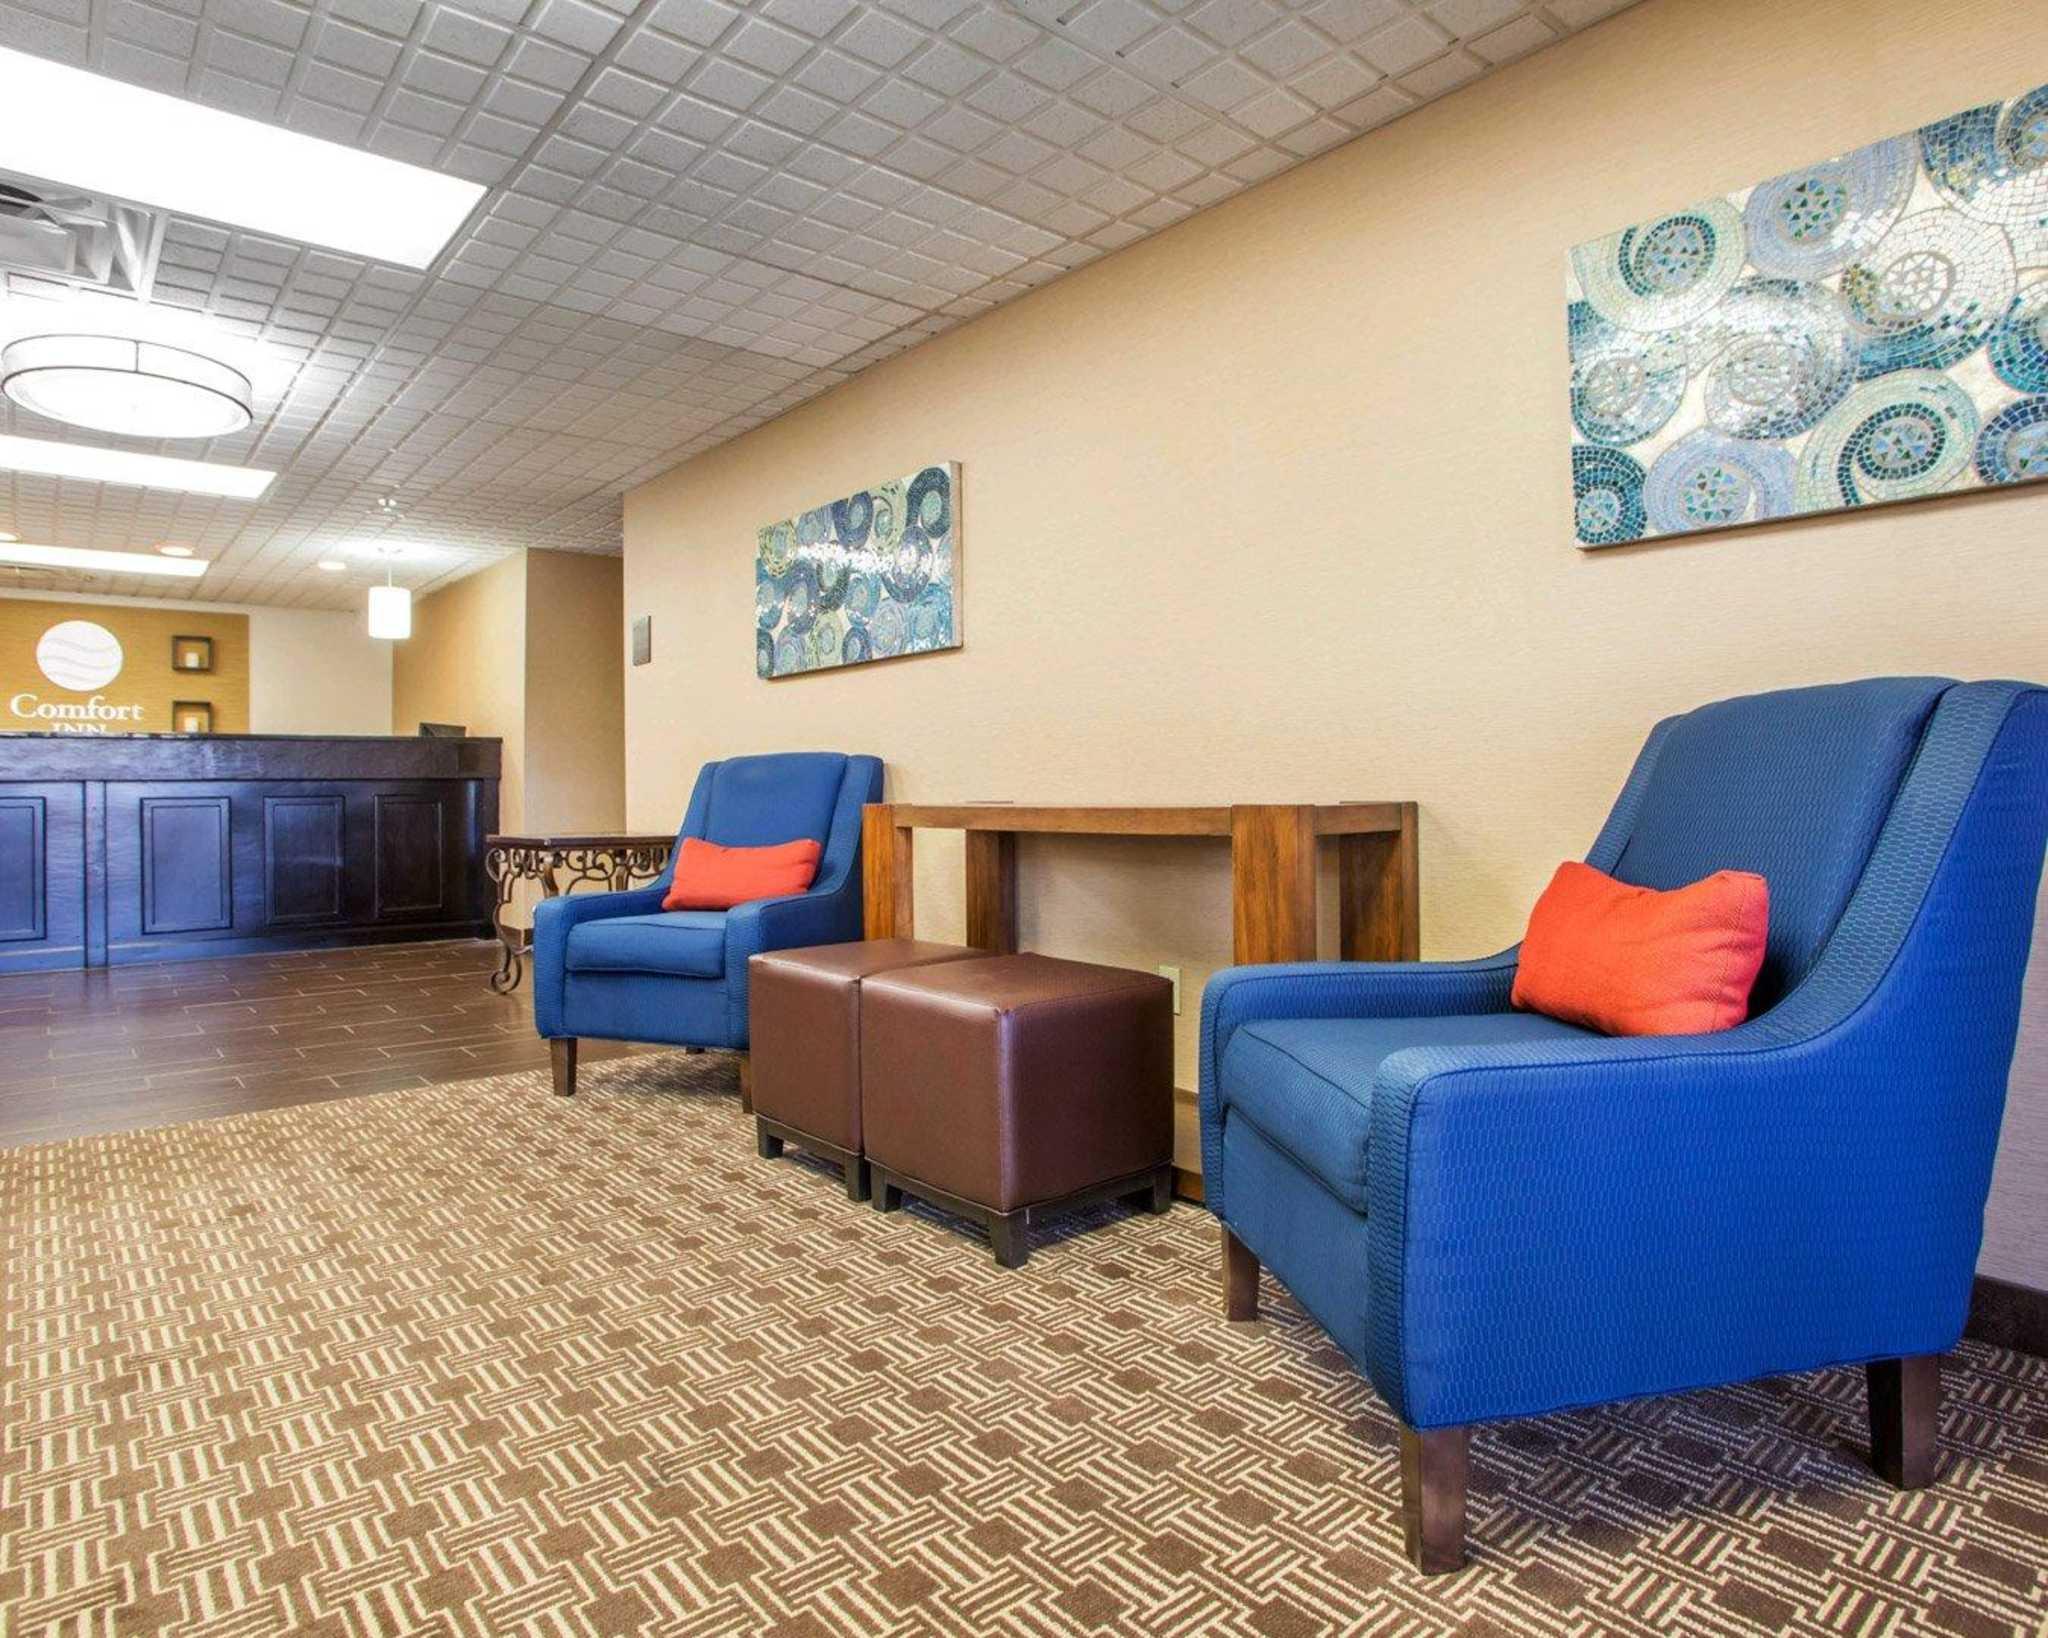 Comfort Inn Dayton - Huber Heights image 19